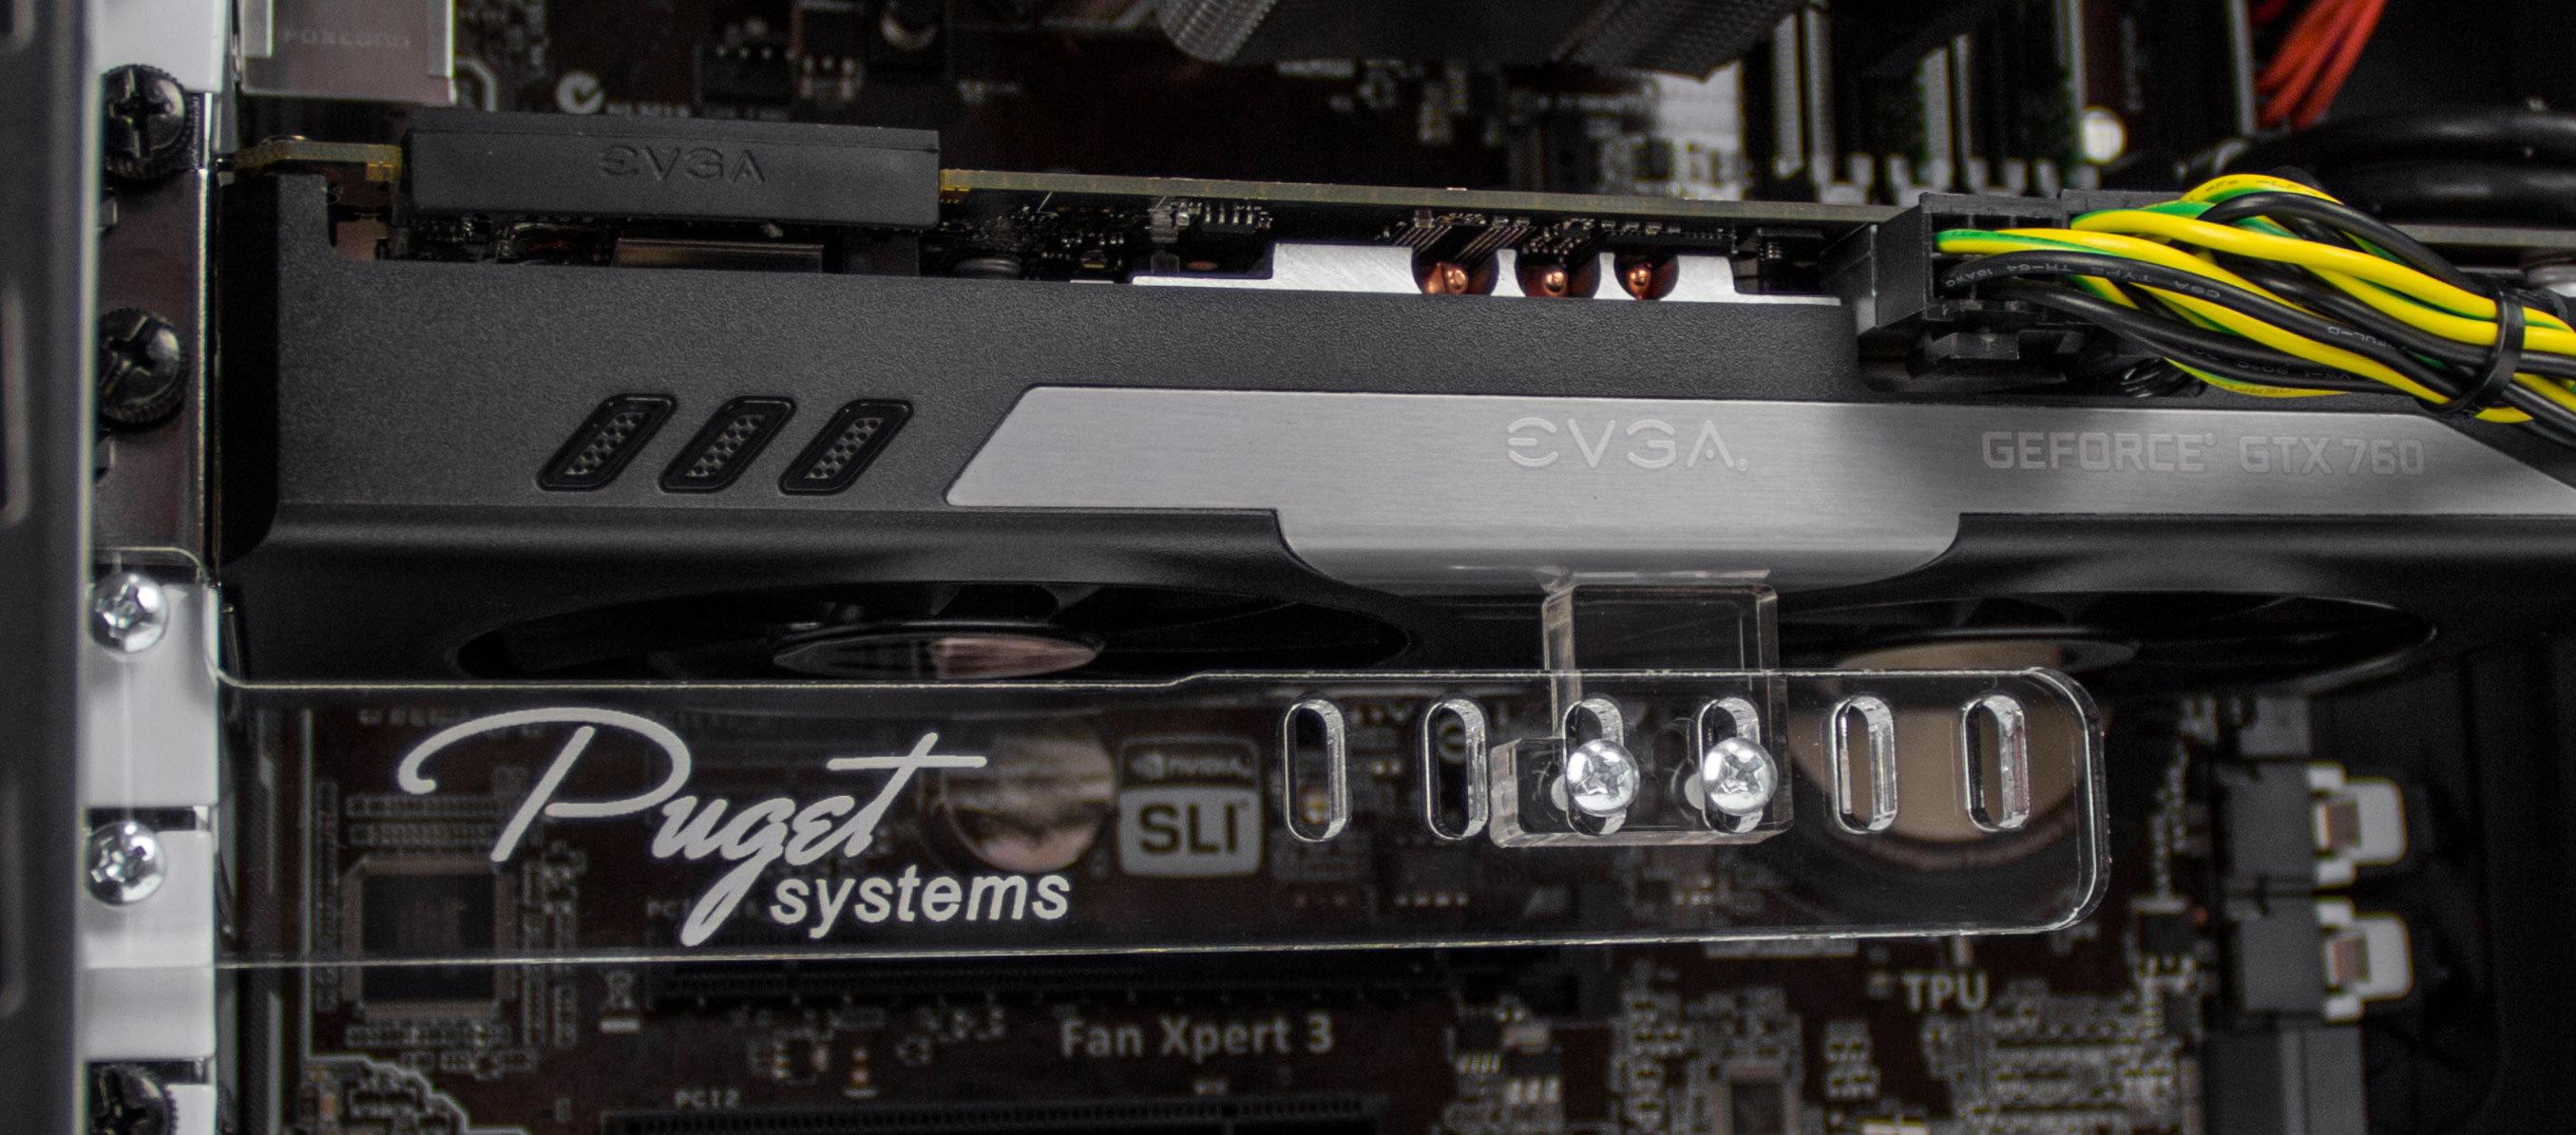 Configure Pc W Puget Systems Universal Acrylic Gpu Brace